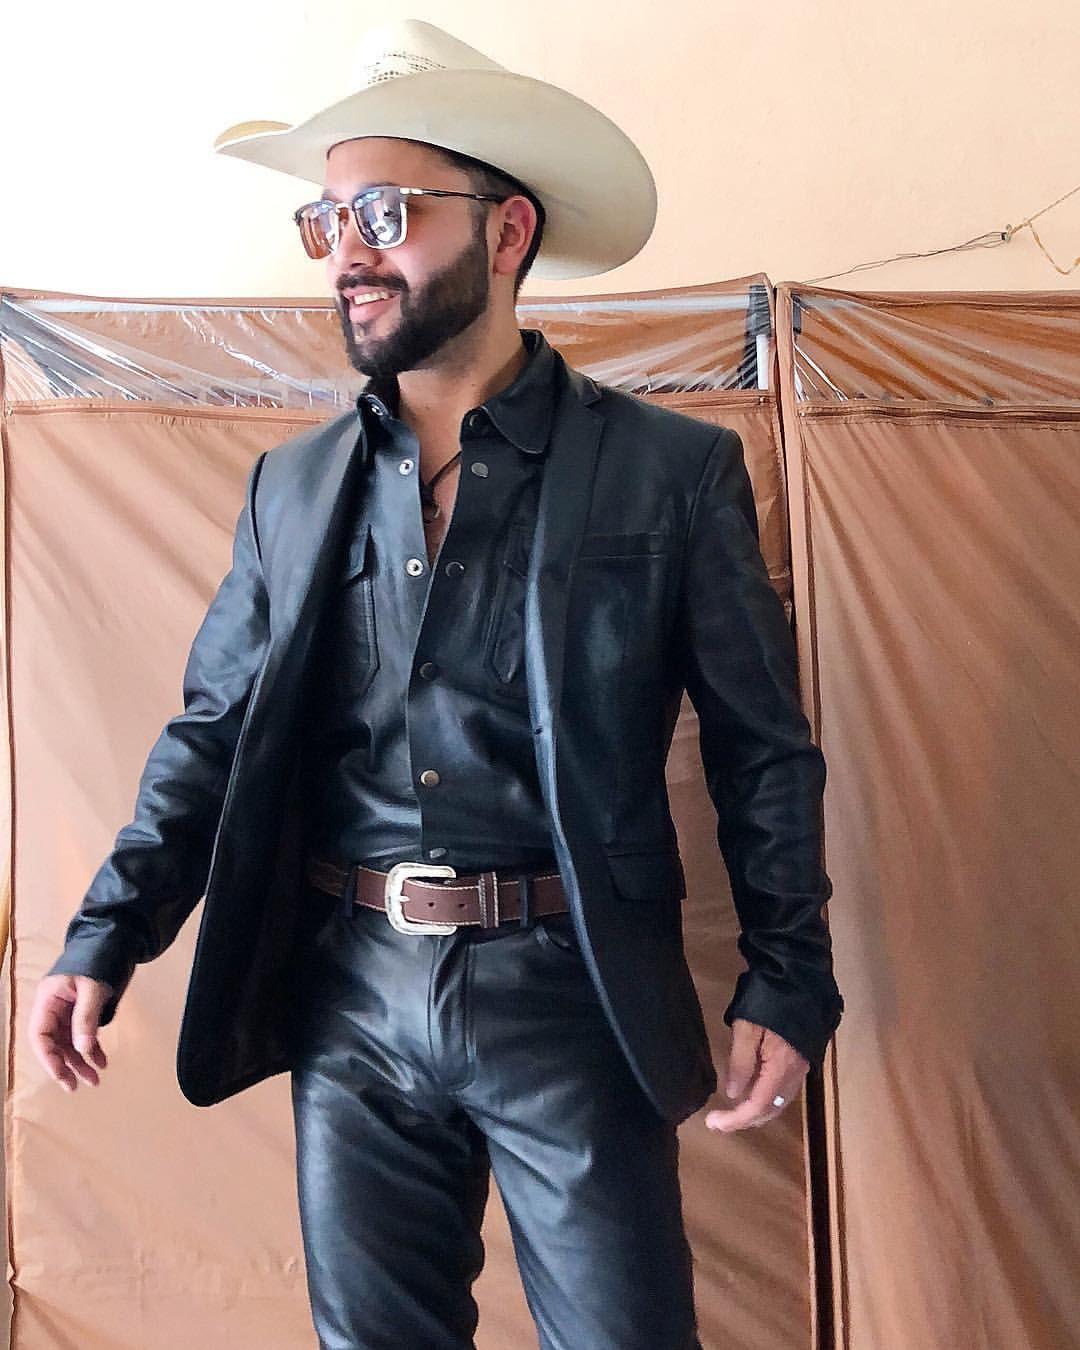 leatherman #leathercowboy #leathersuit #fullleather